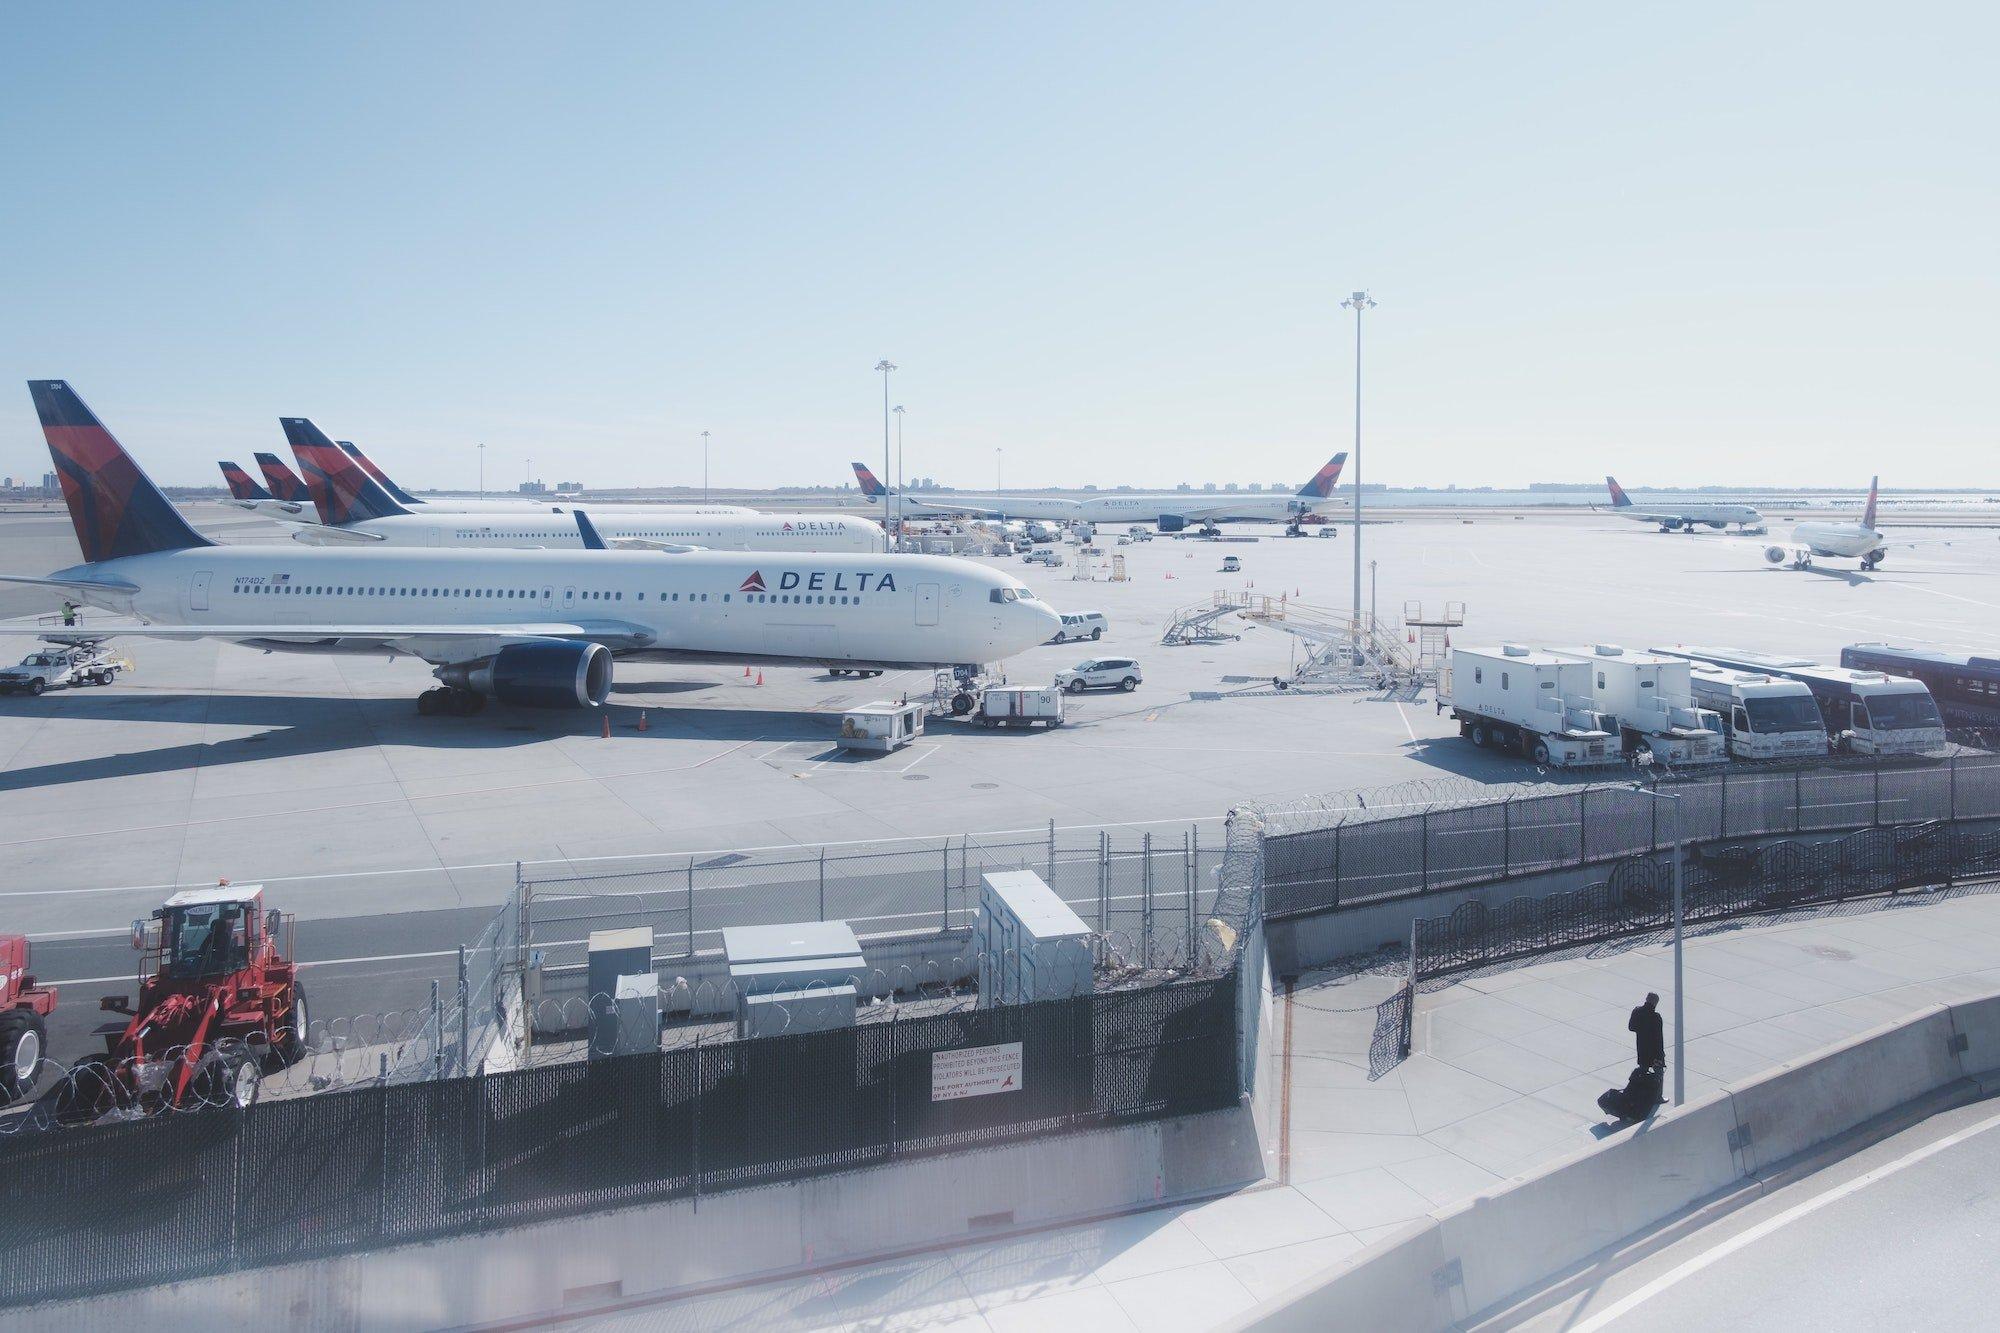 NYS: Traveler COVID-19 Testing as Alternative to 14-Day Quarantine